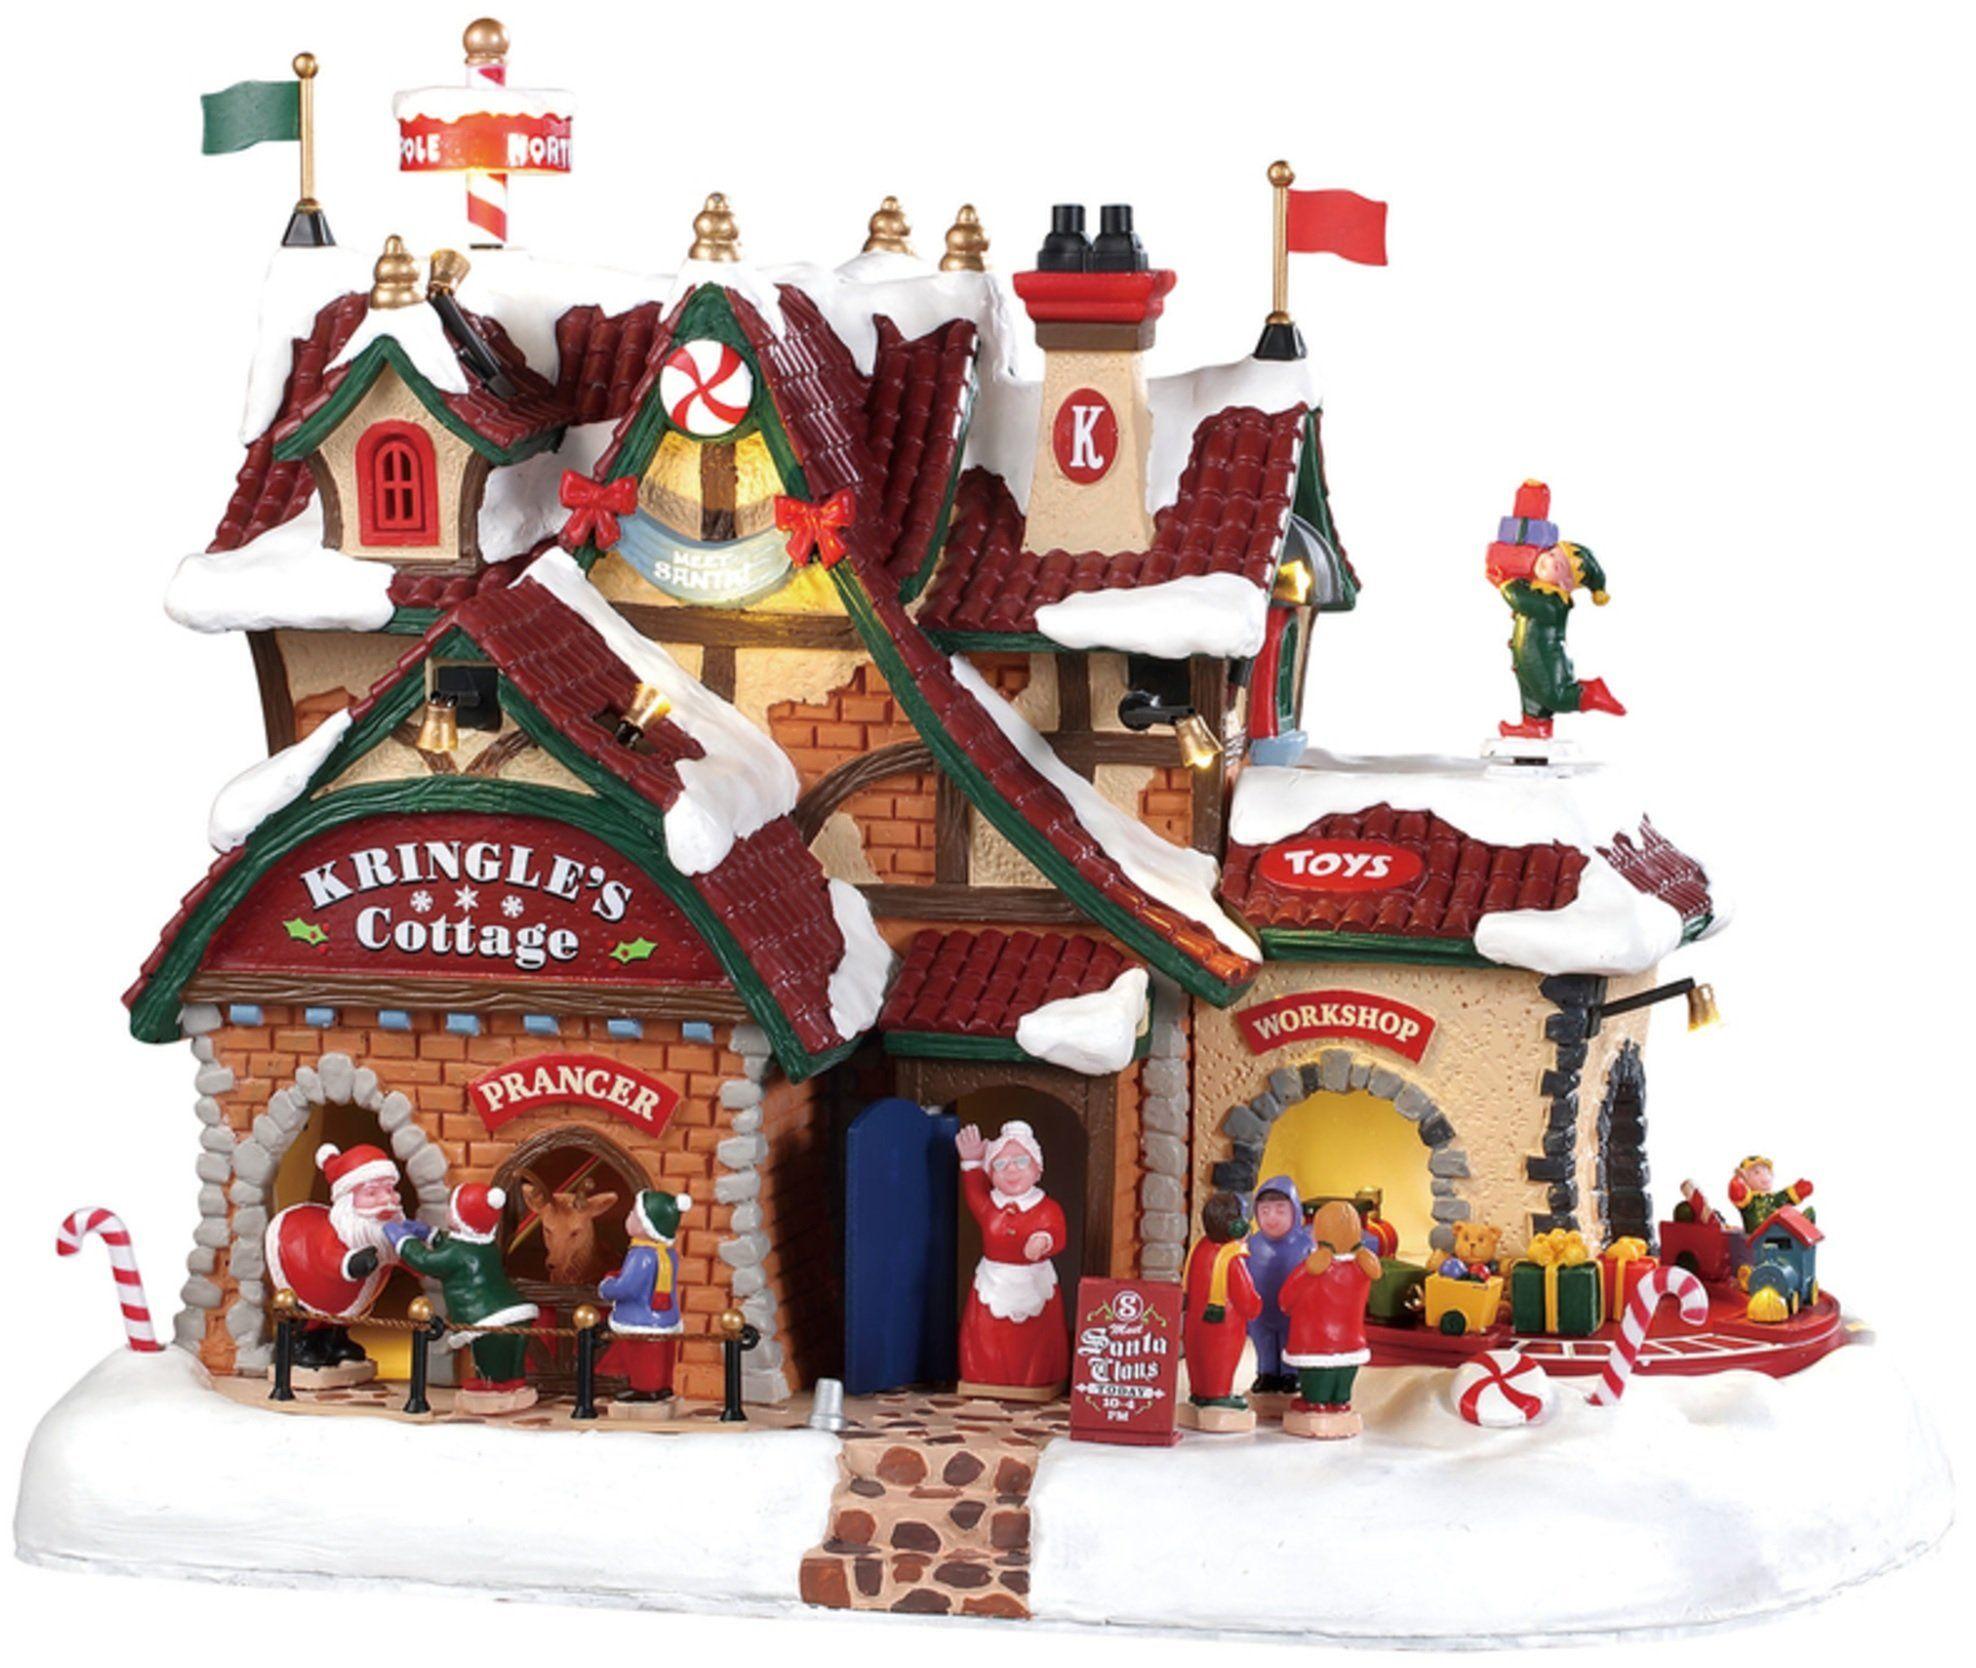 Lemax 2021 Christmas Village House Lemax 95462 Kringle S Cottage Christmas Village Building Multicolored In 2021 Lemax Christmas Village Lemax Christmas Christmas Village Collections